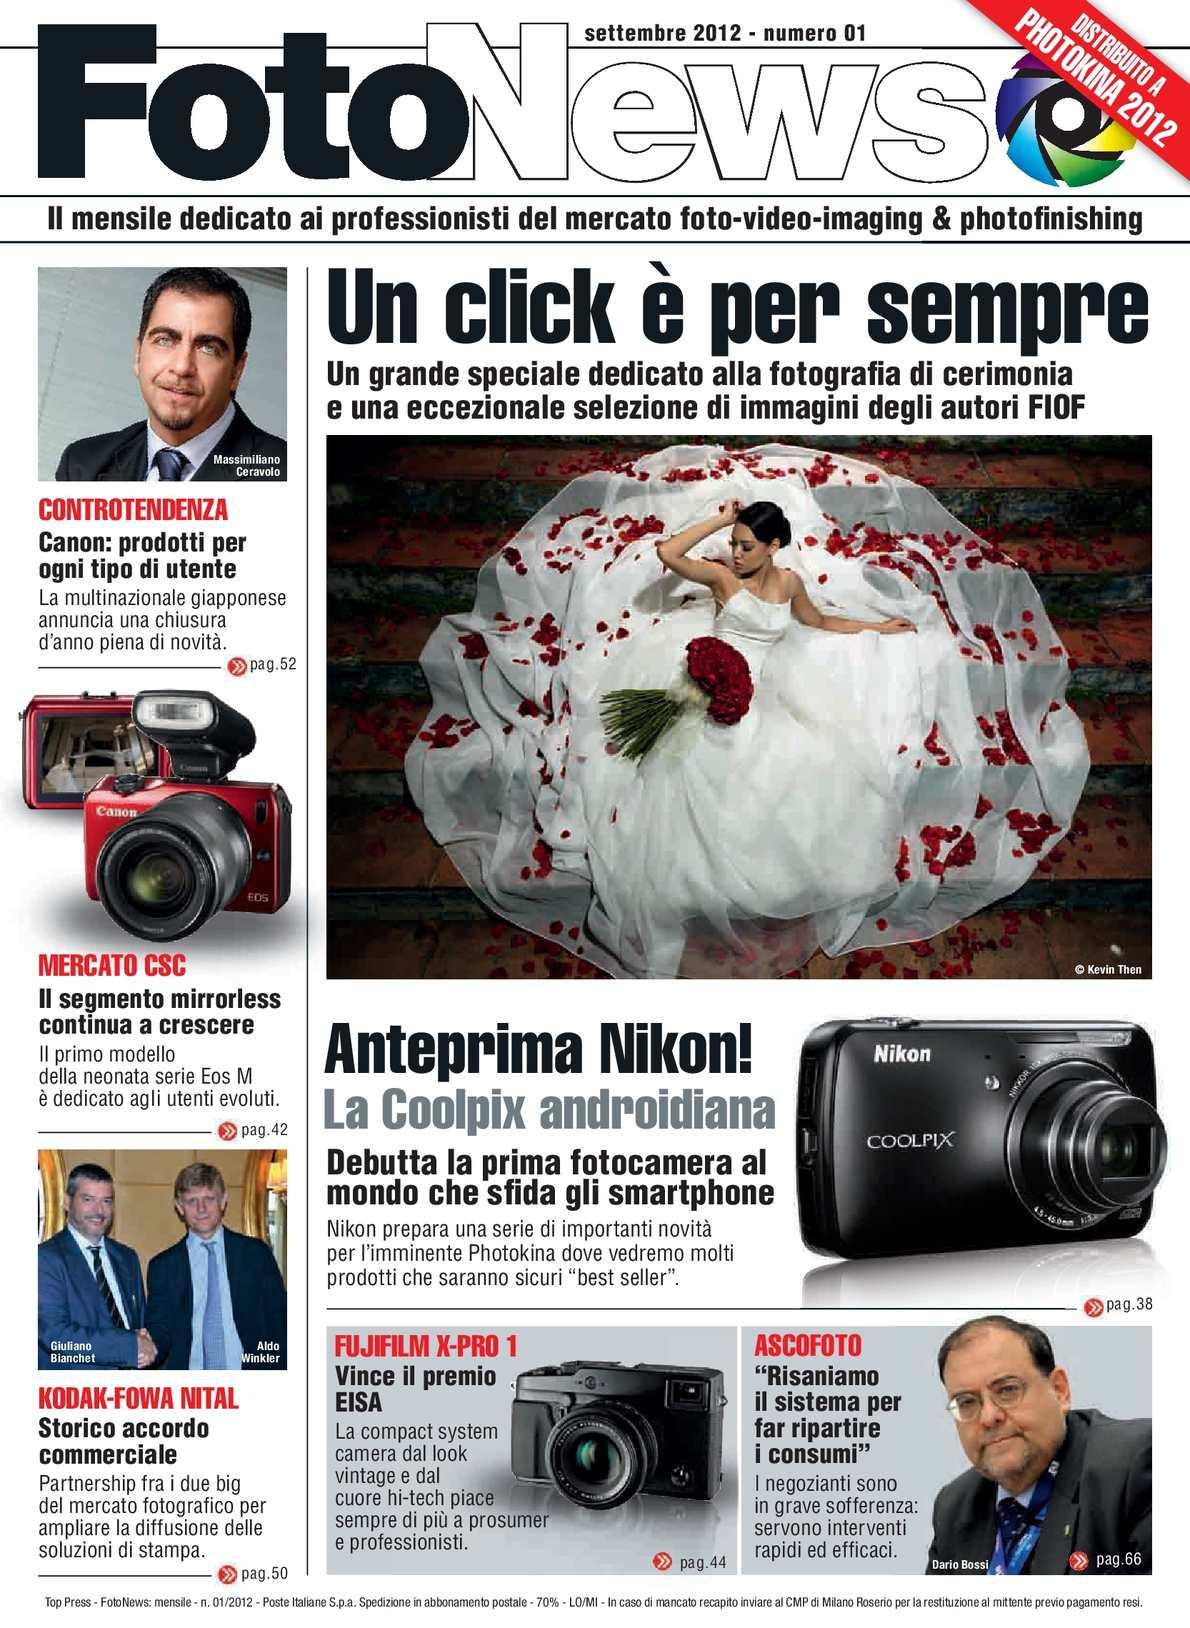 FotoNews 01 settembre 2012